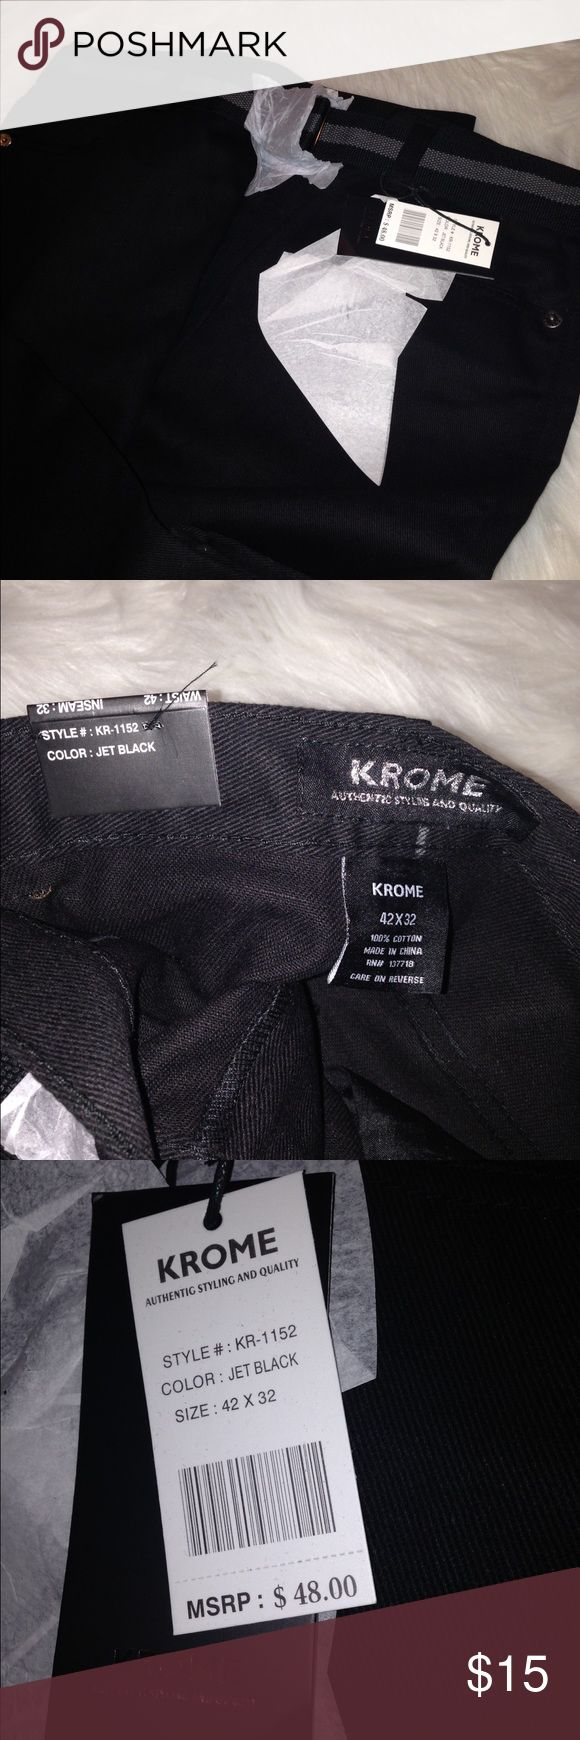 Krome men's pants Brand new Krome men's pants size 42x32 color on tag is jet black krome Pants